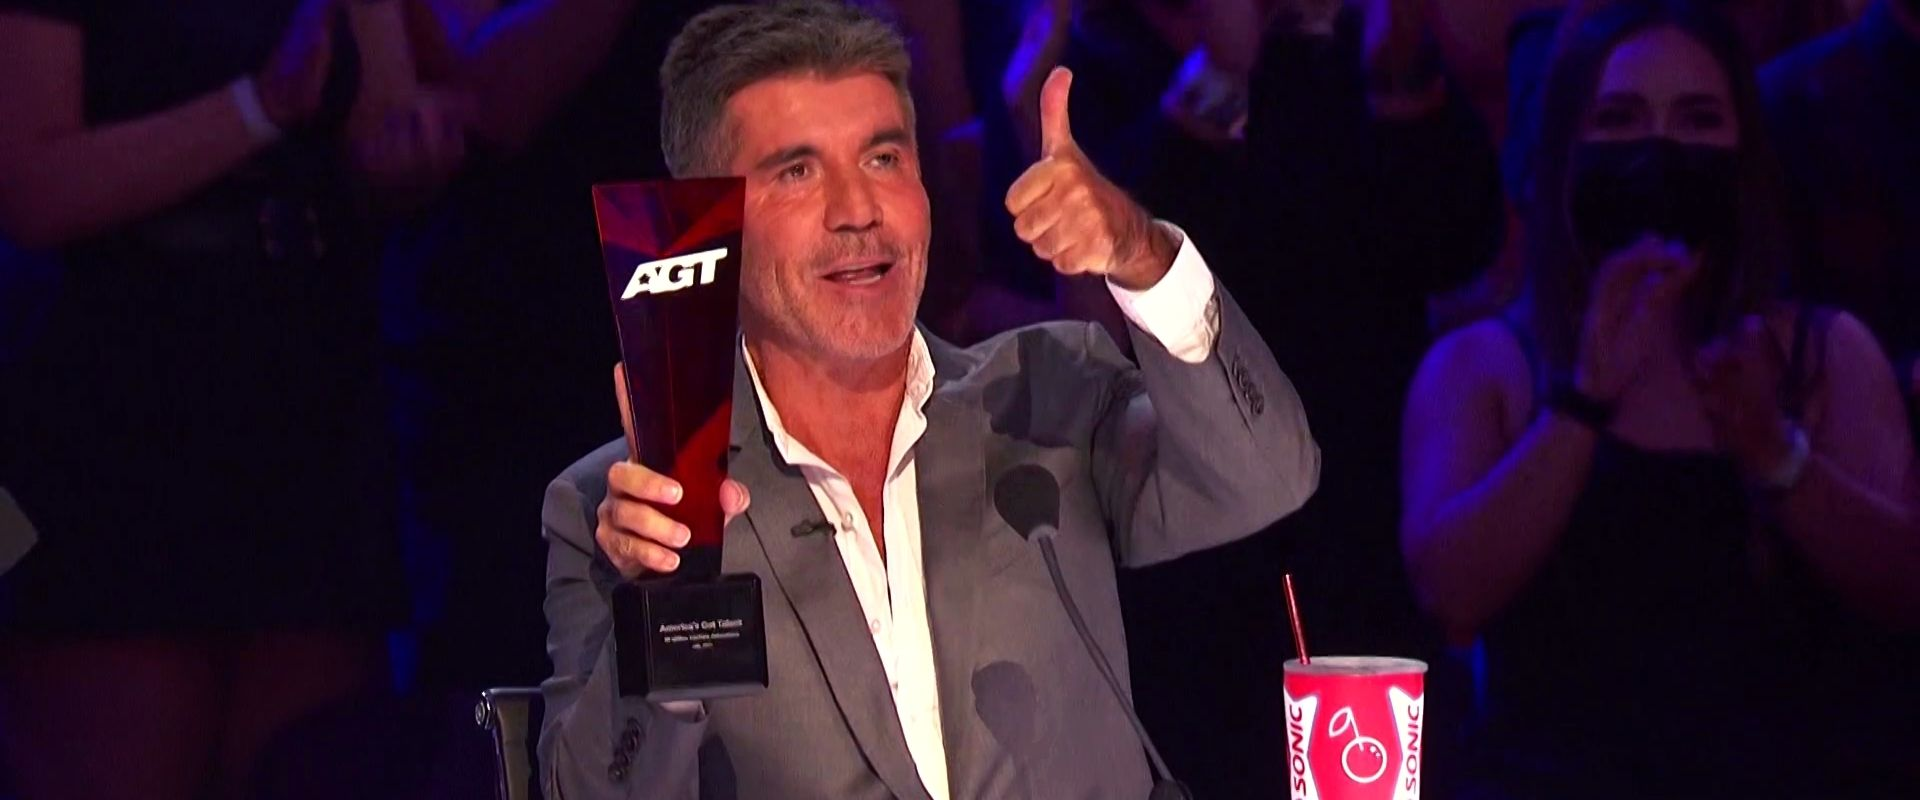 America Got Talent Season 16 Episode 19